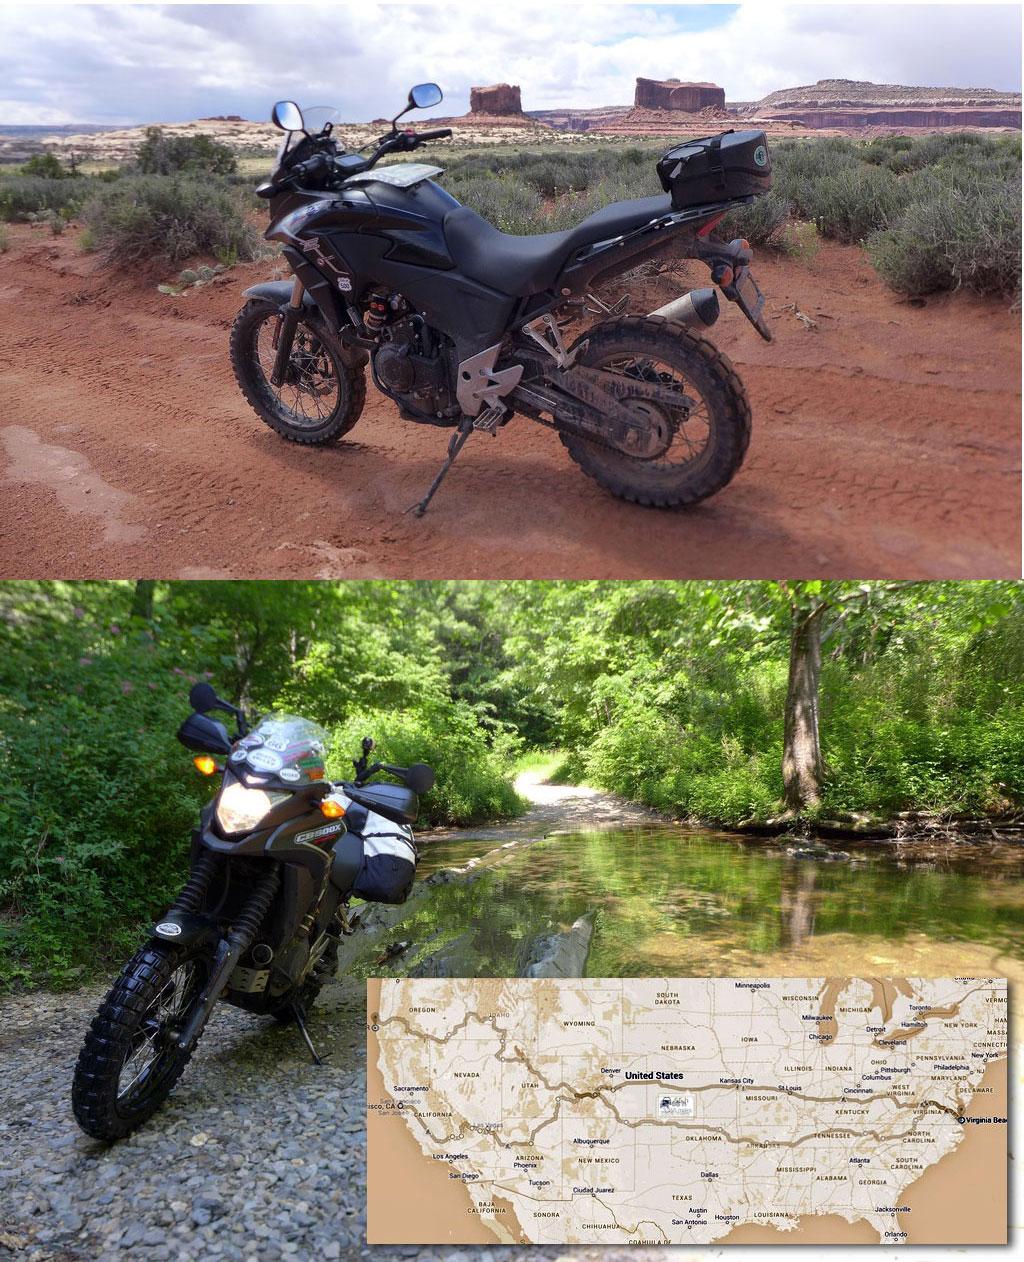 Honda cbx 500 review - You Can Read About The Full Development Jmotat